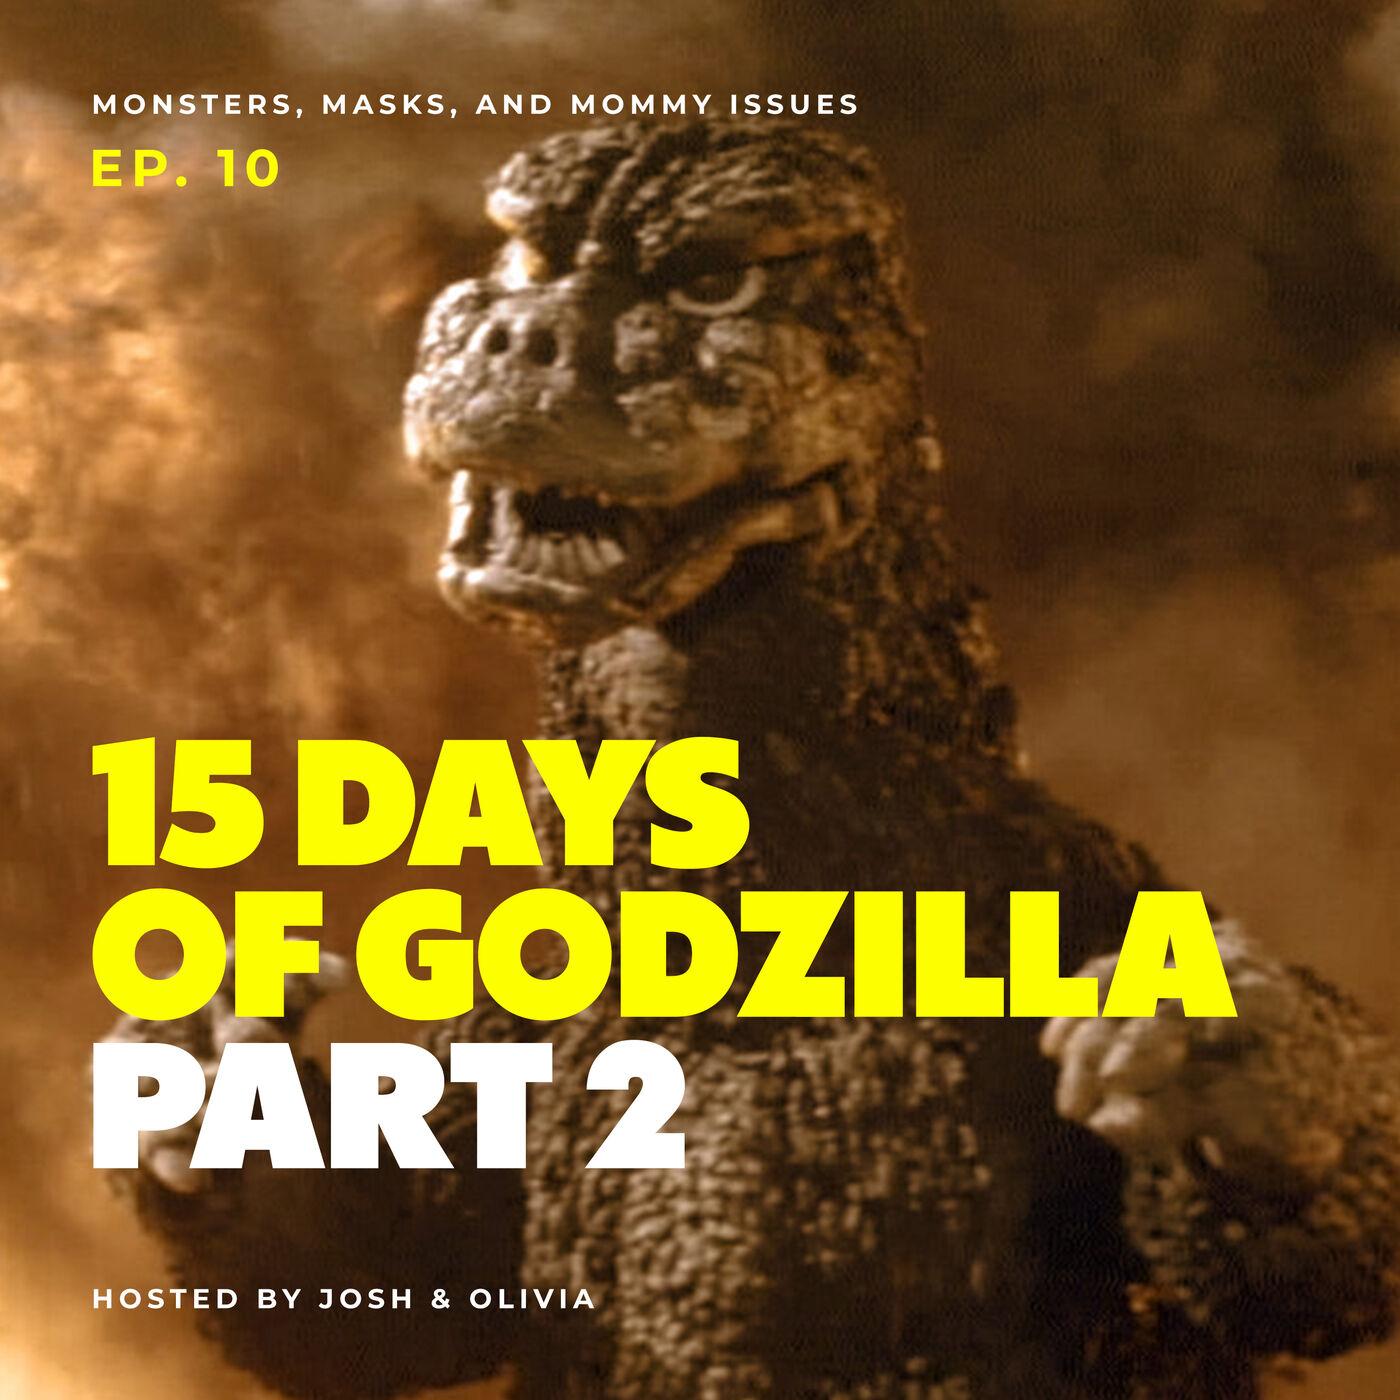 15 Days of Godzilla: Part 2